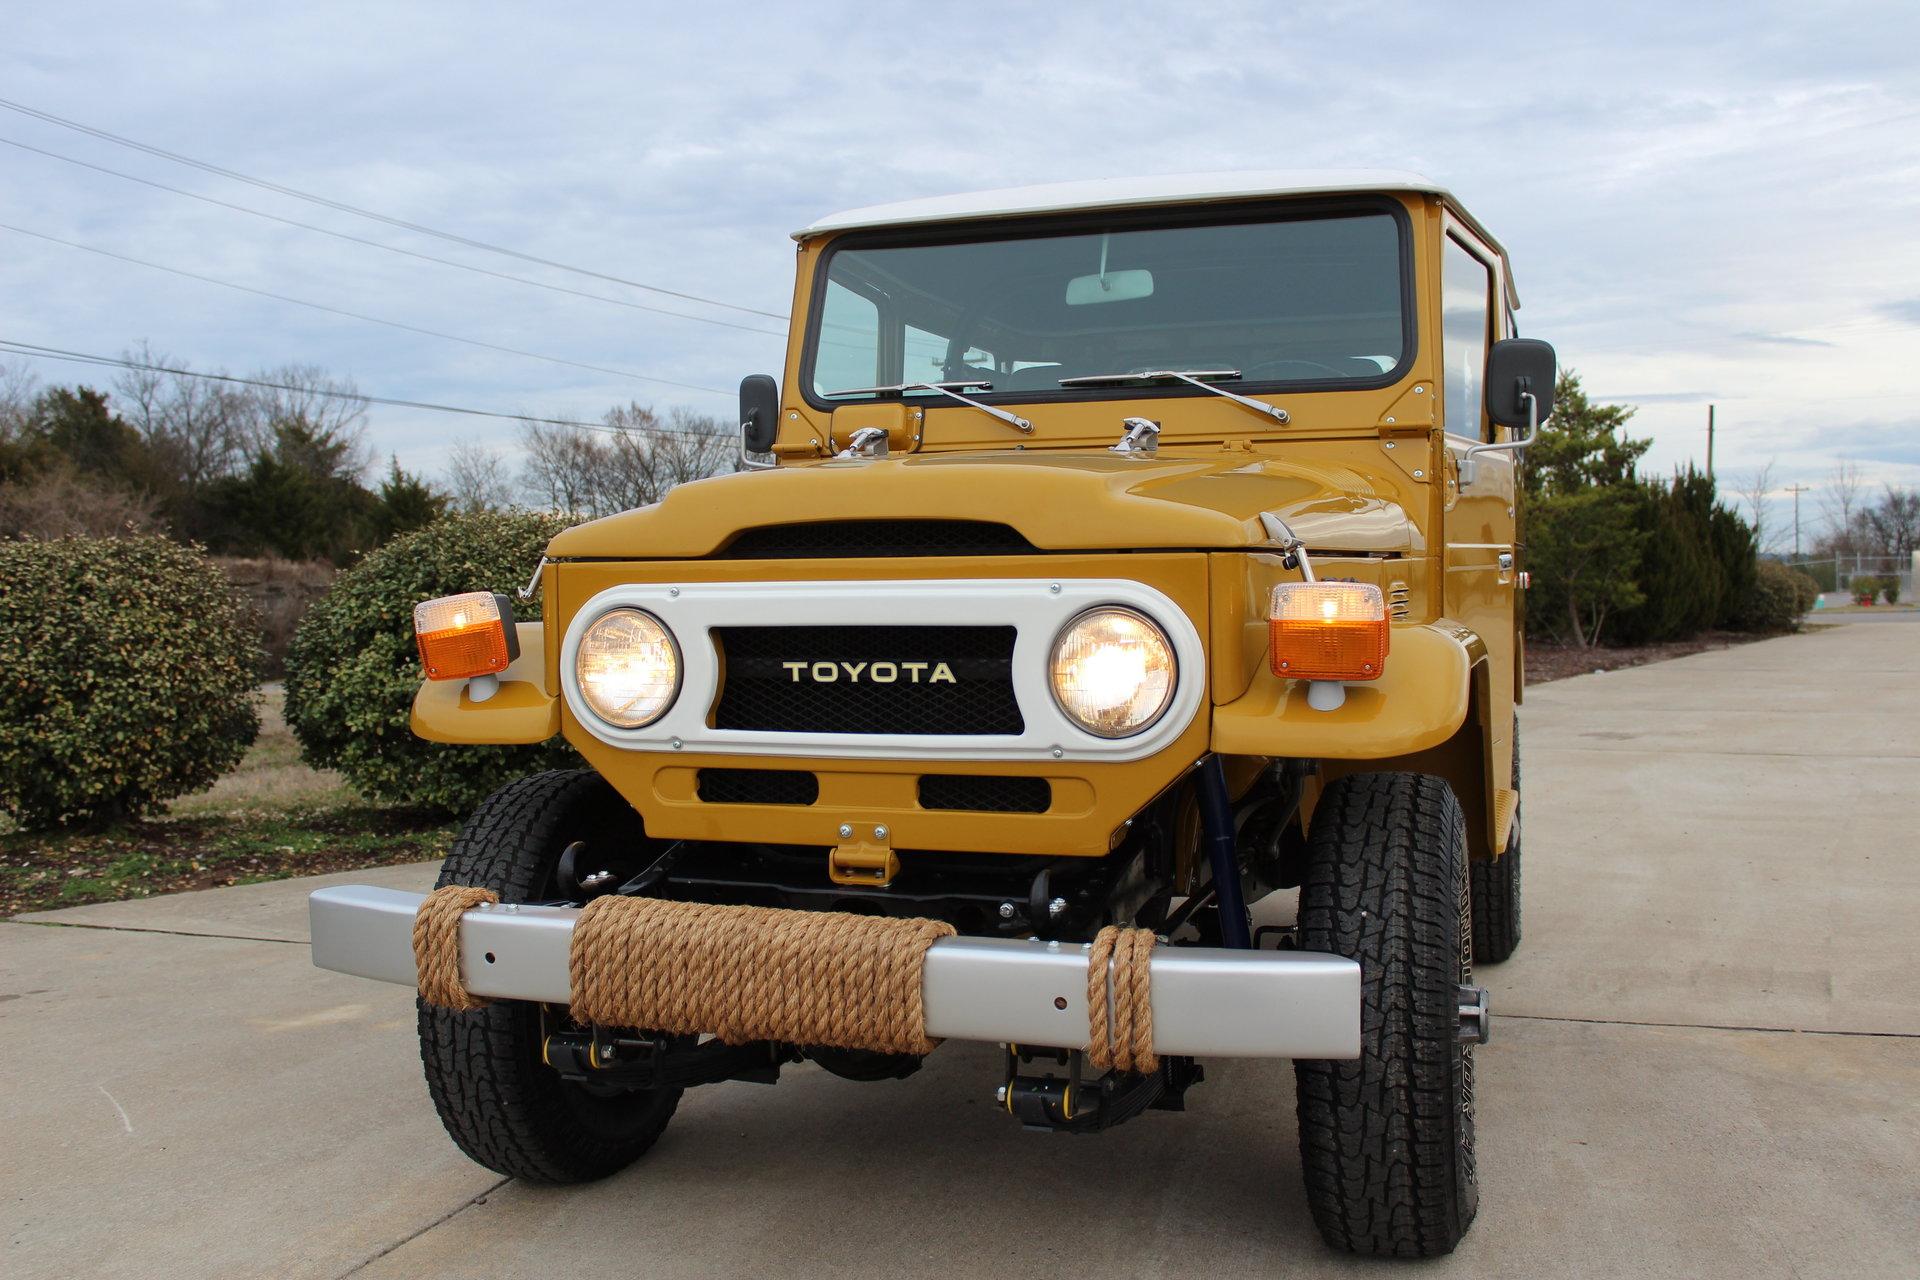 1976 Toyota Land Cruiser Fj40 For Sale 80937 Mcg